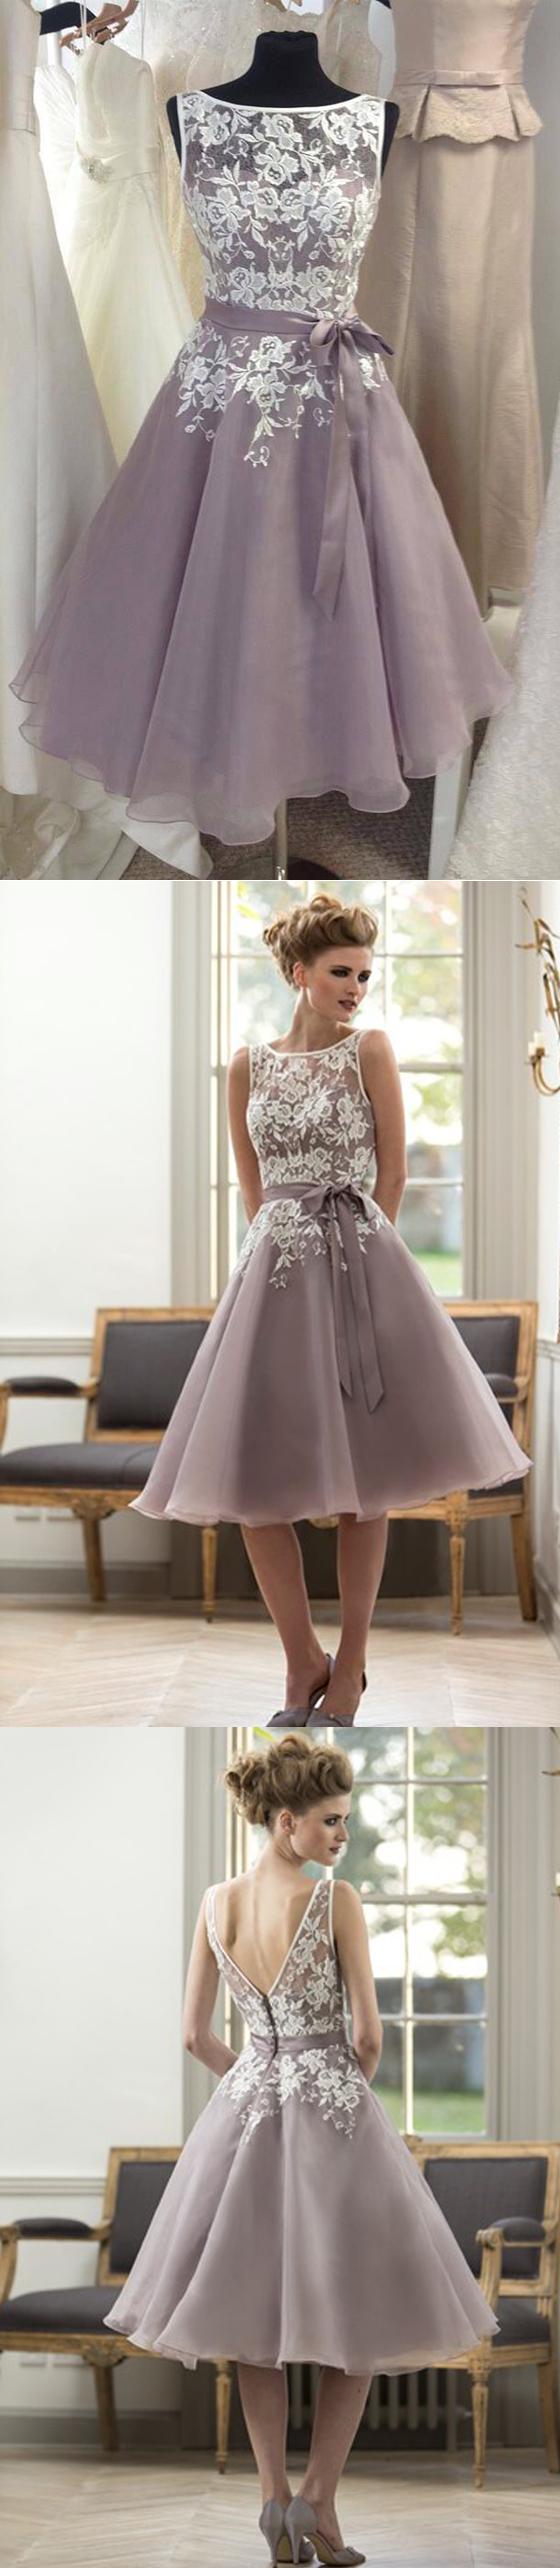 Scoop neckline lace top short bridesmaid dresses with sash formal